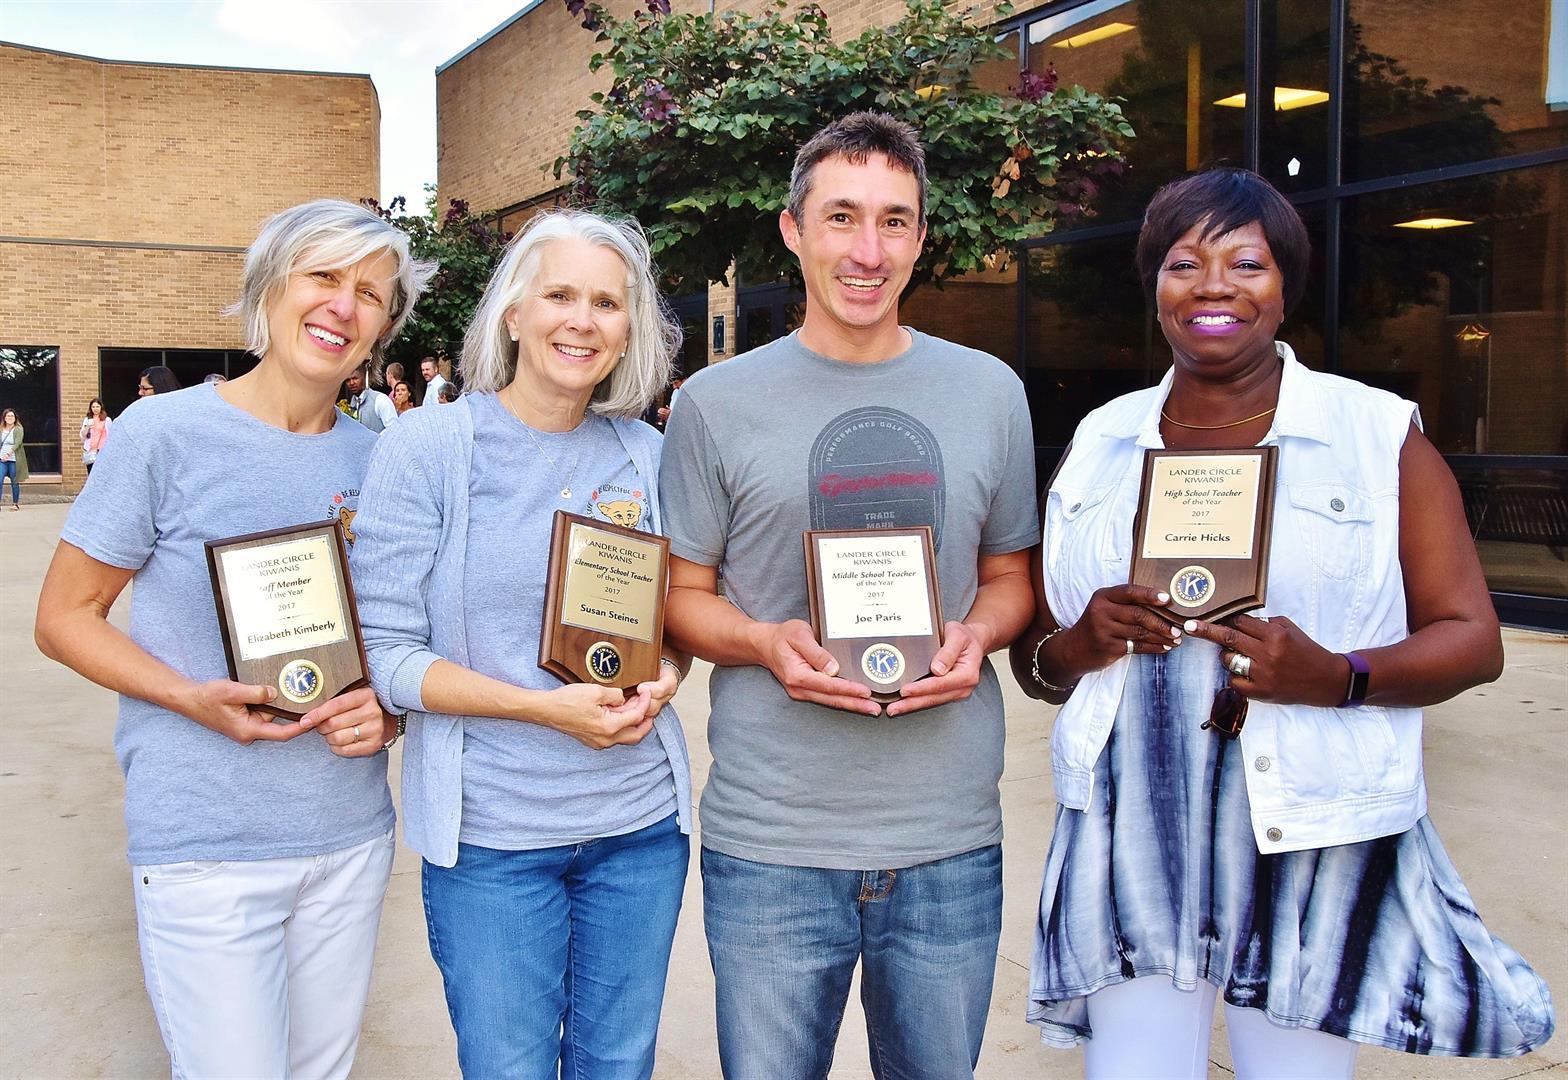 Kiwanis Winners Hold Plaques